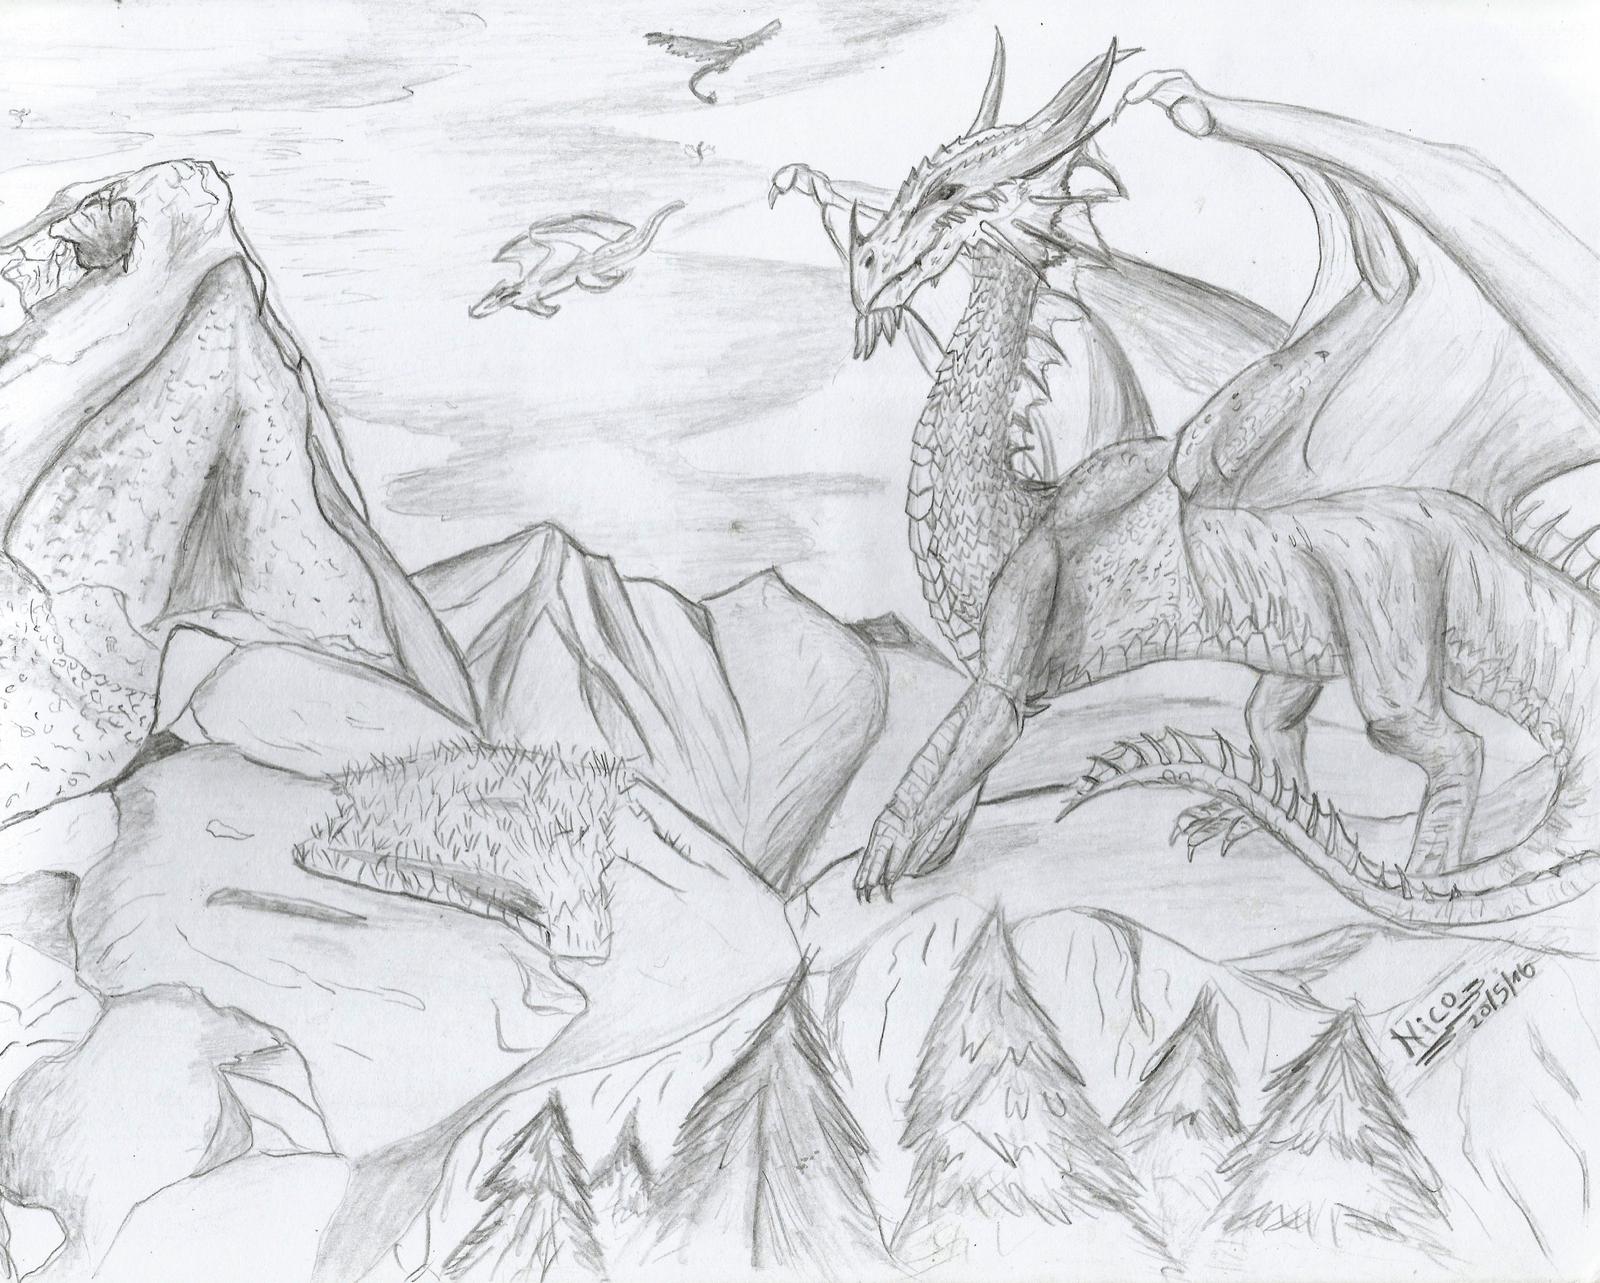 dragon 2 by nicowtc